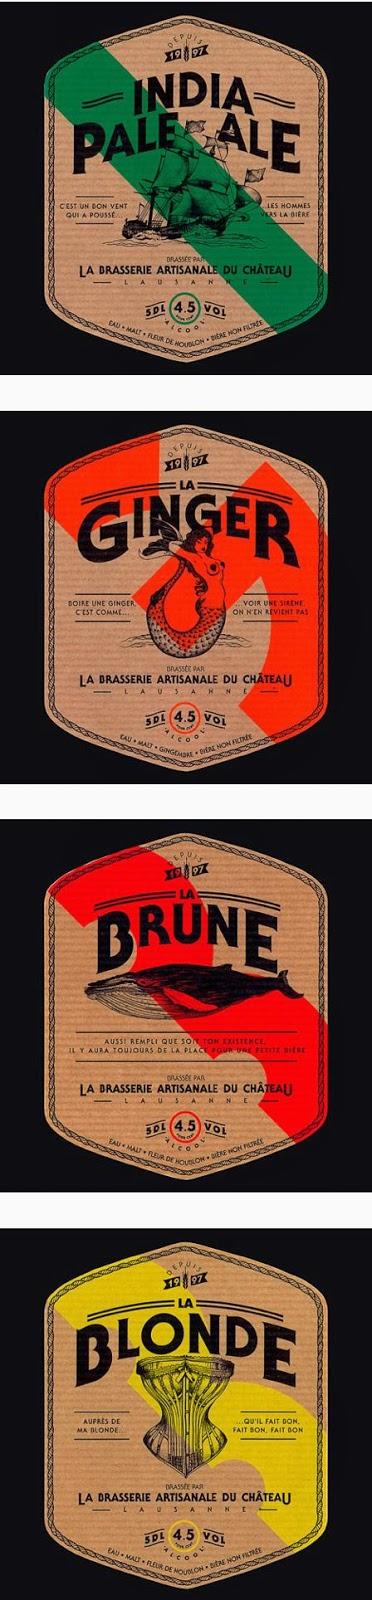 birra bottiglia vino bottle etichetta etichette packaging immagine branding marketing